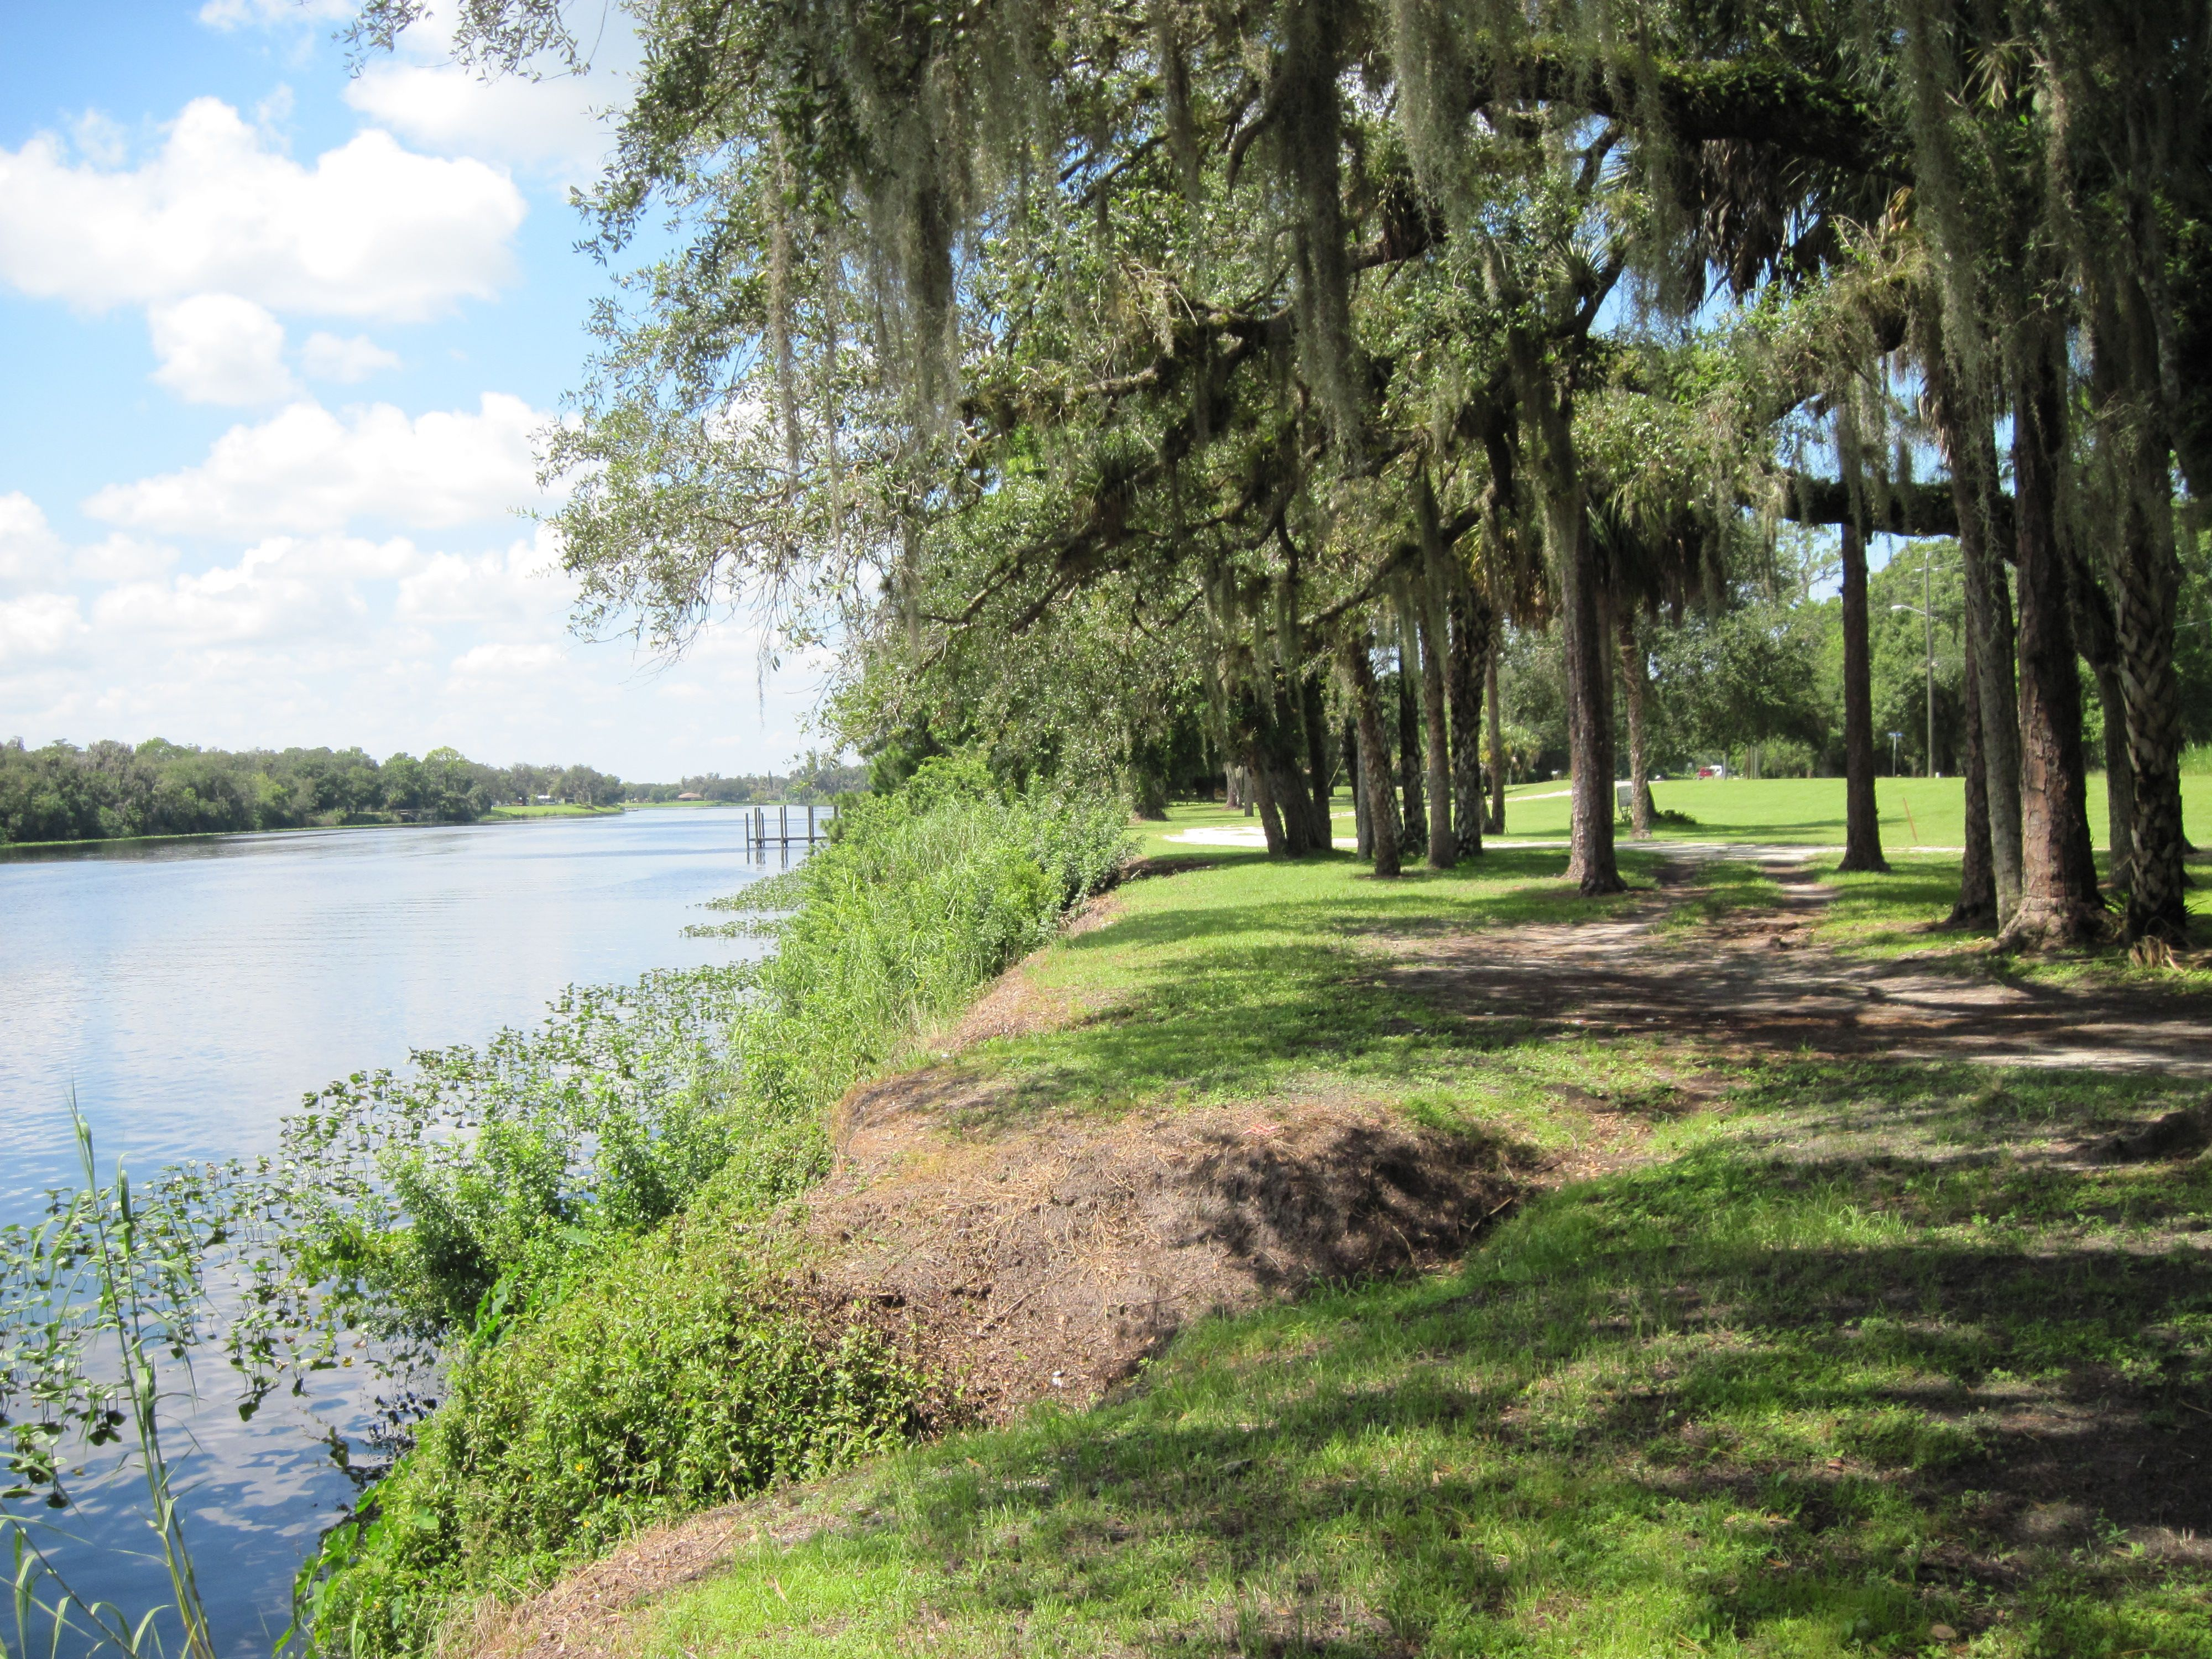 Caloosahatchee River Labelle Fl Florida City Labelle Florida Ravenna Ohio